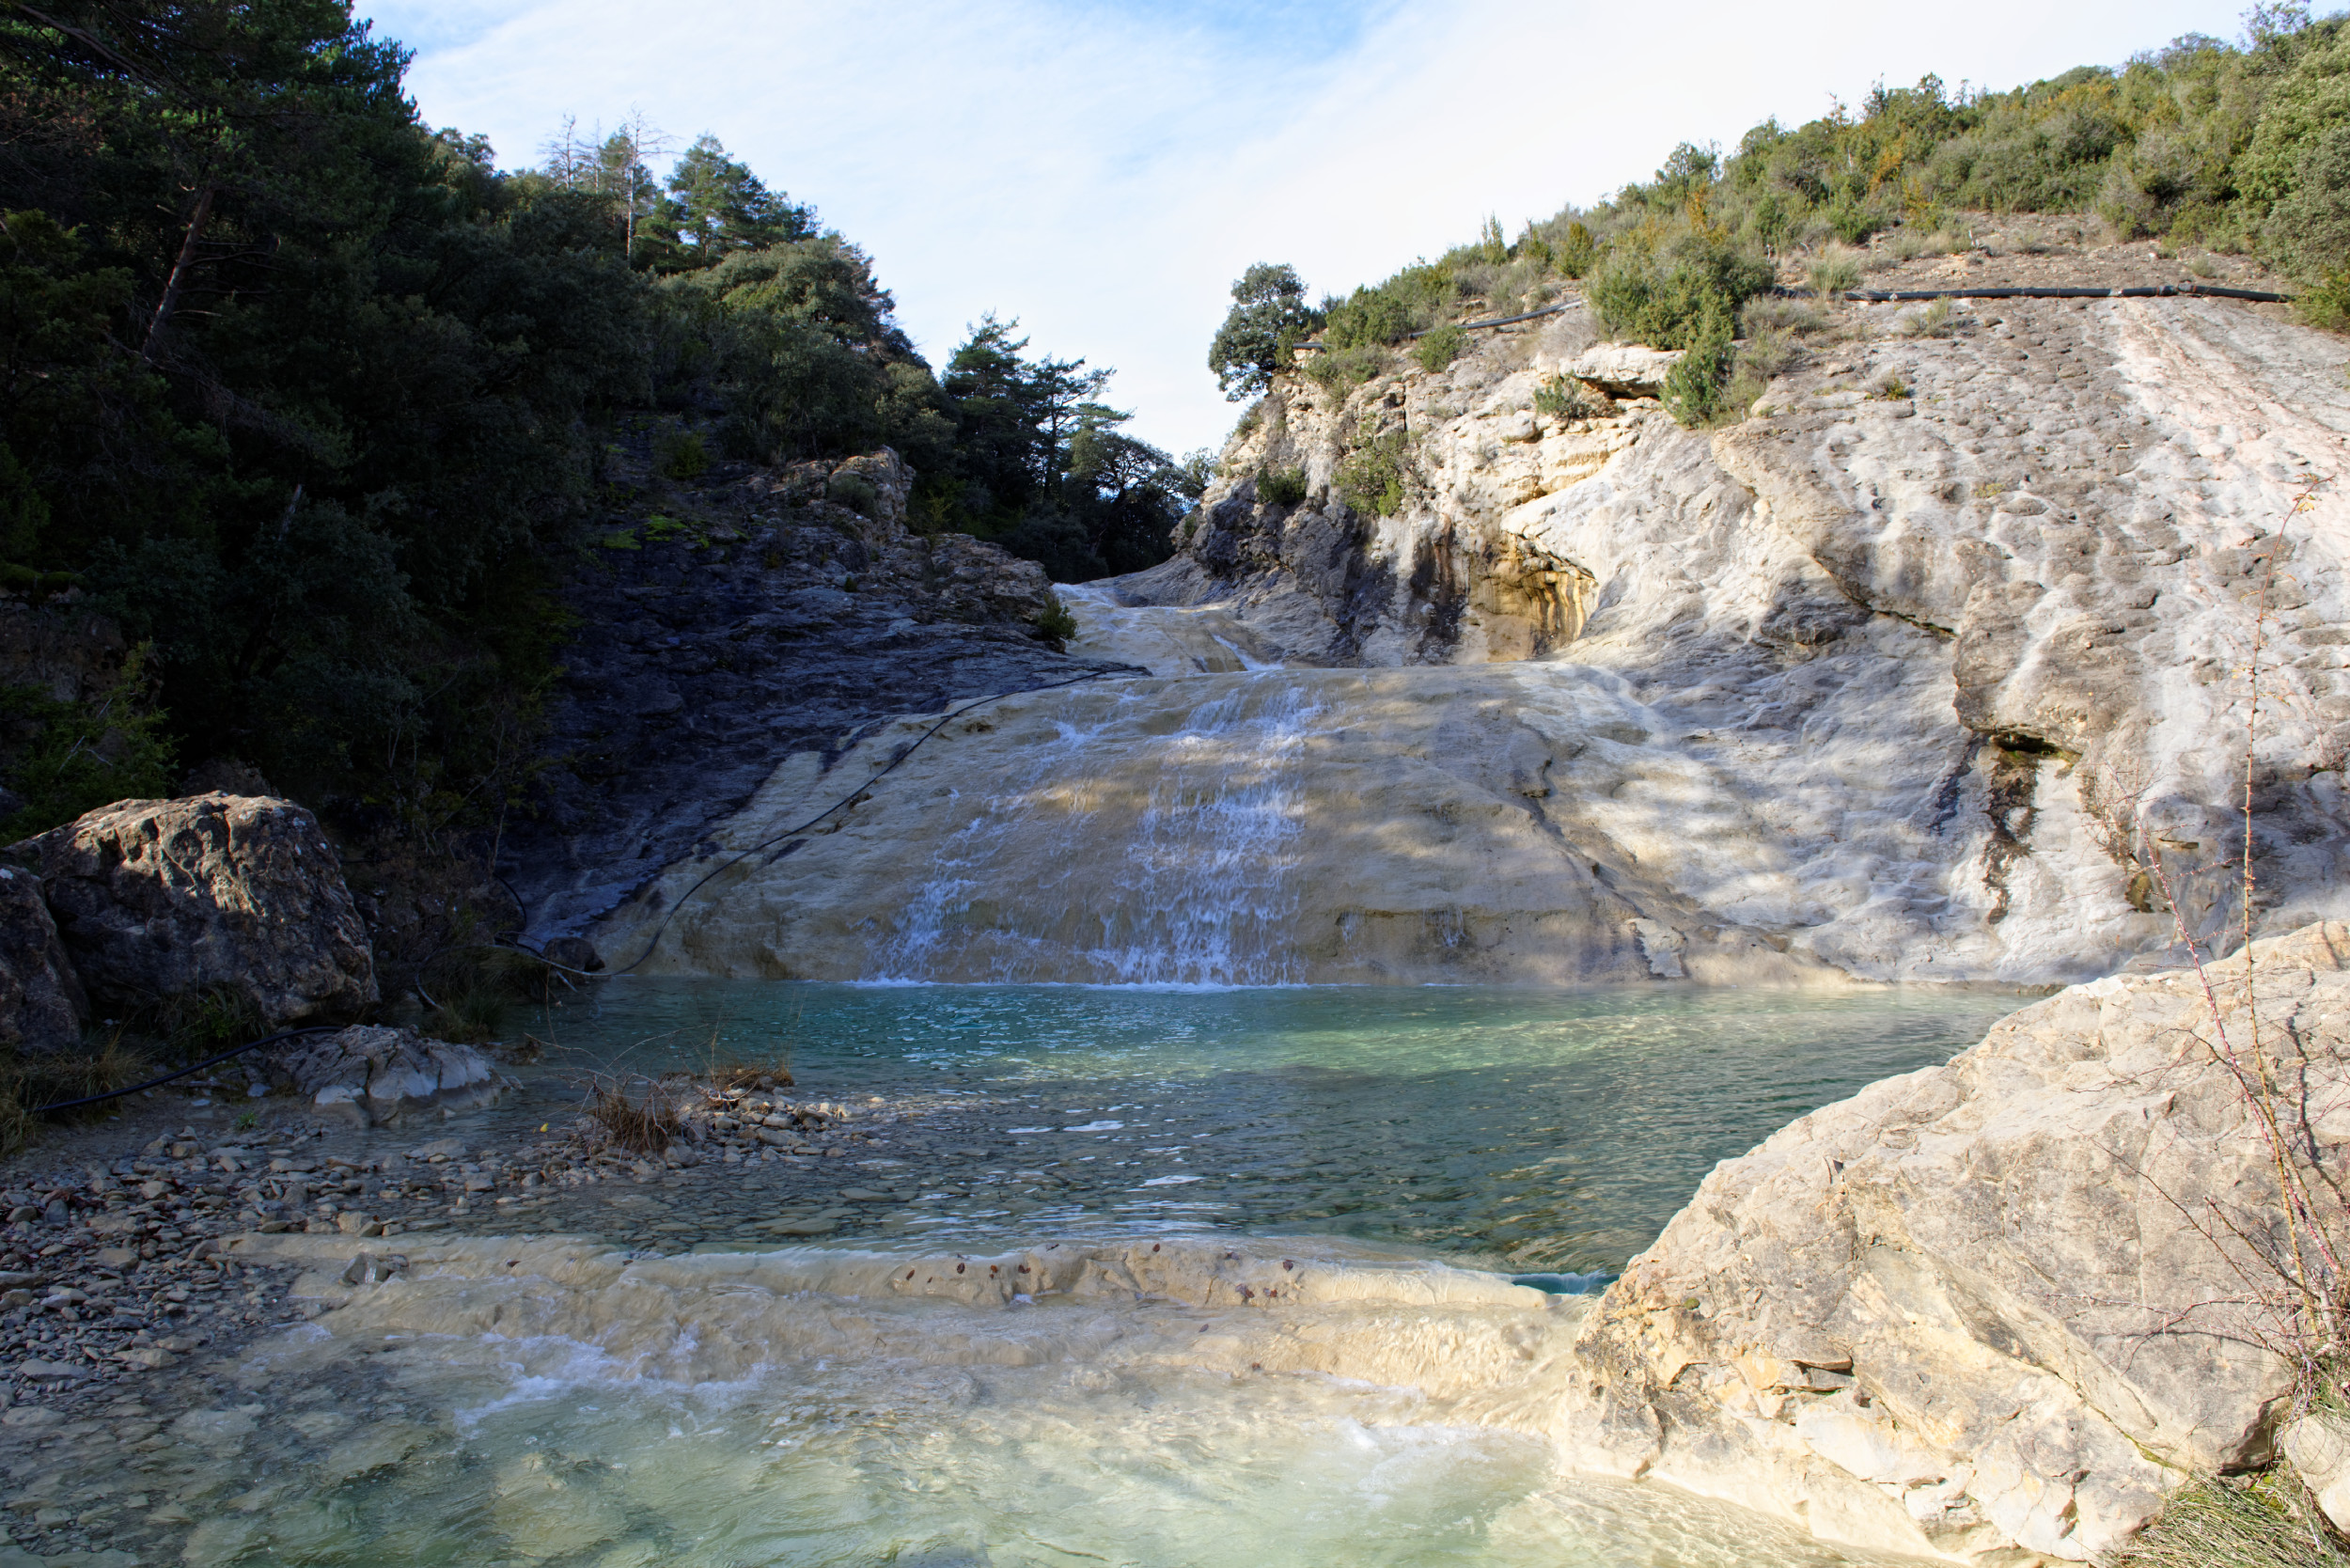 141208-Sieste - Canyon et Barranco (Sobrarbe) (18)